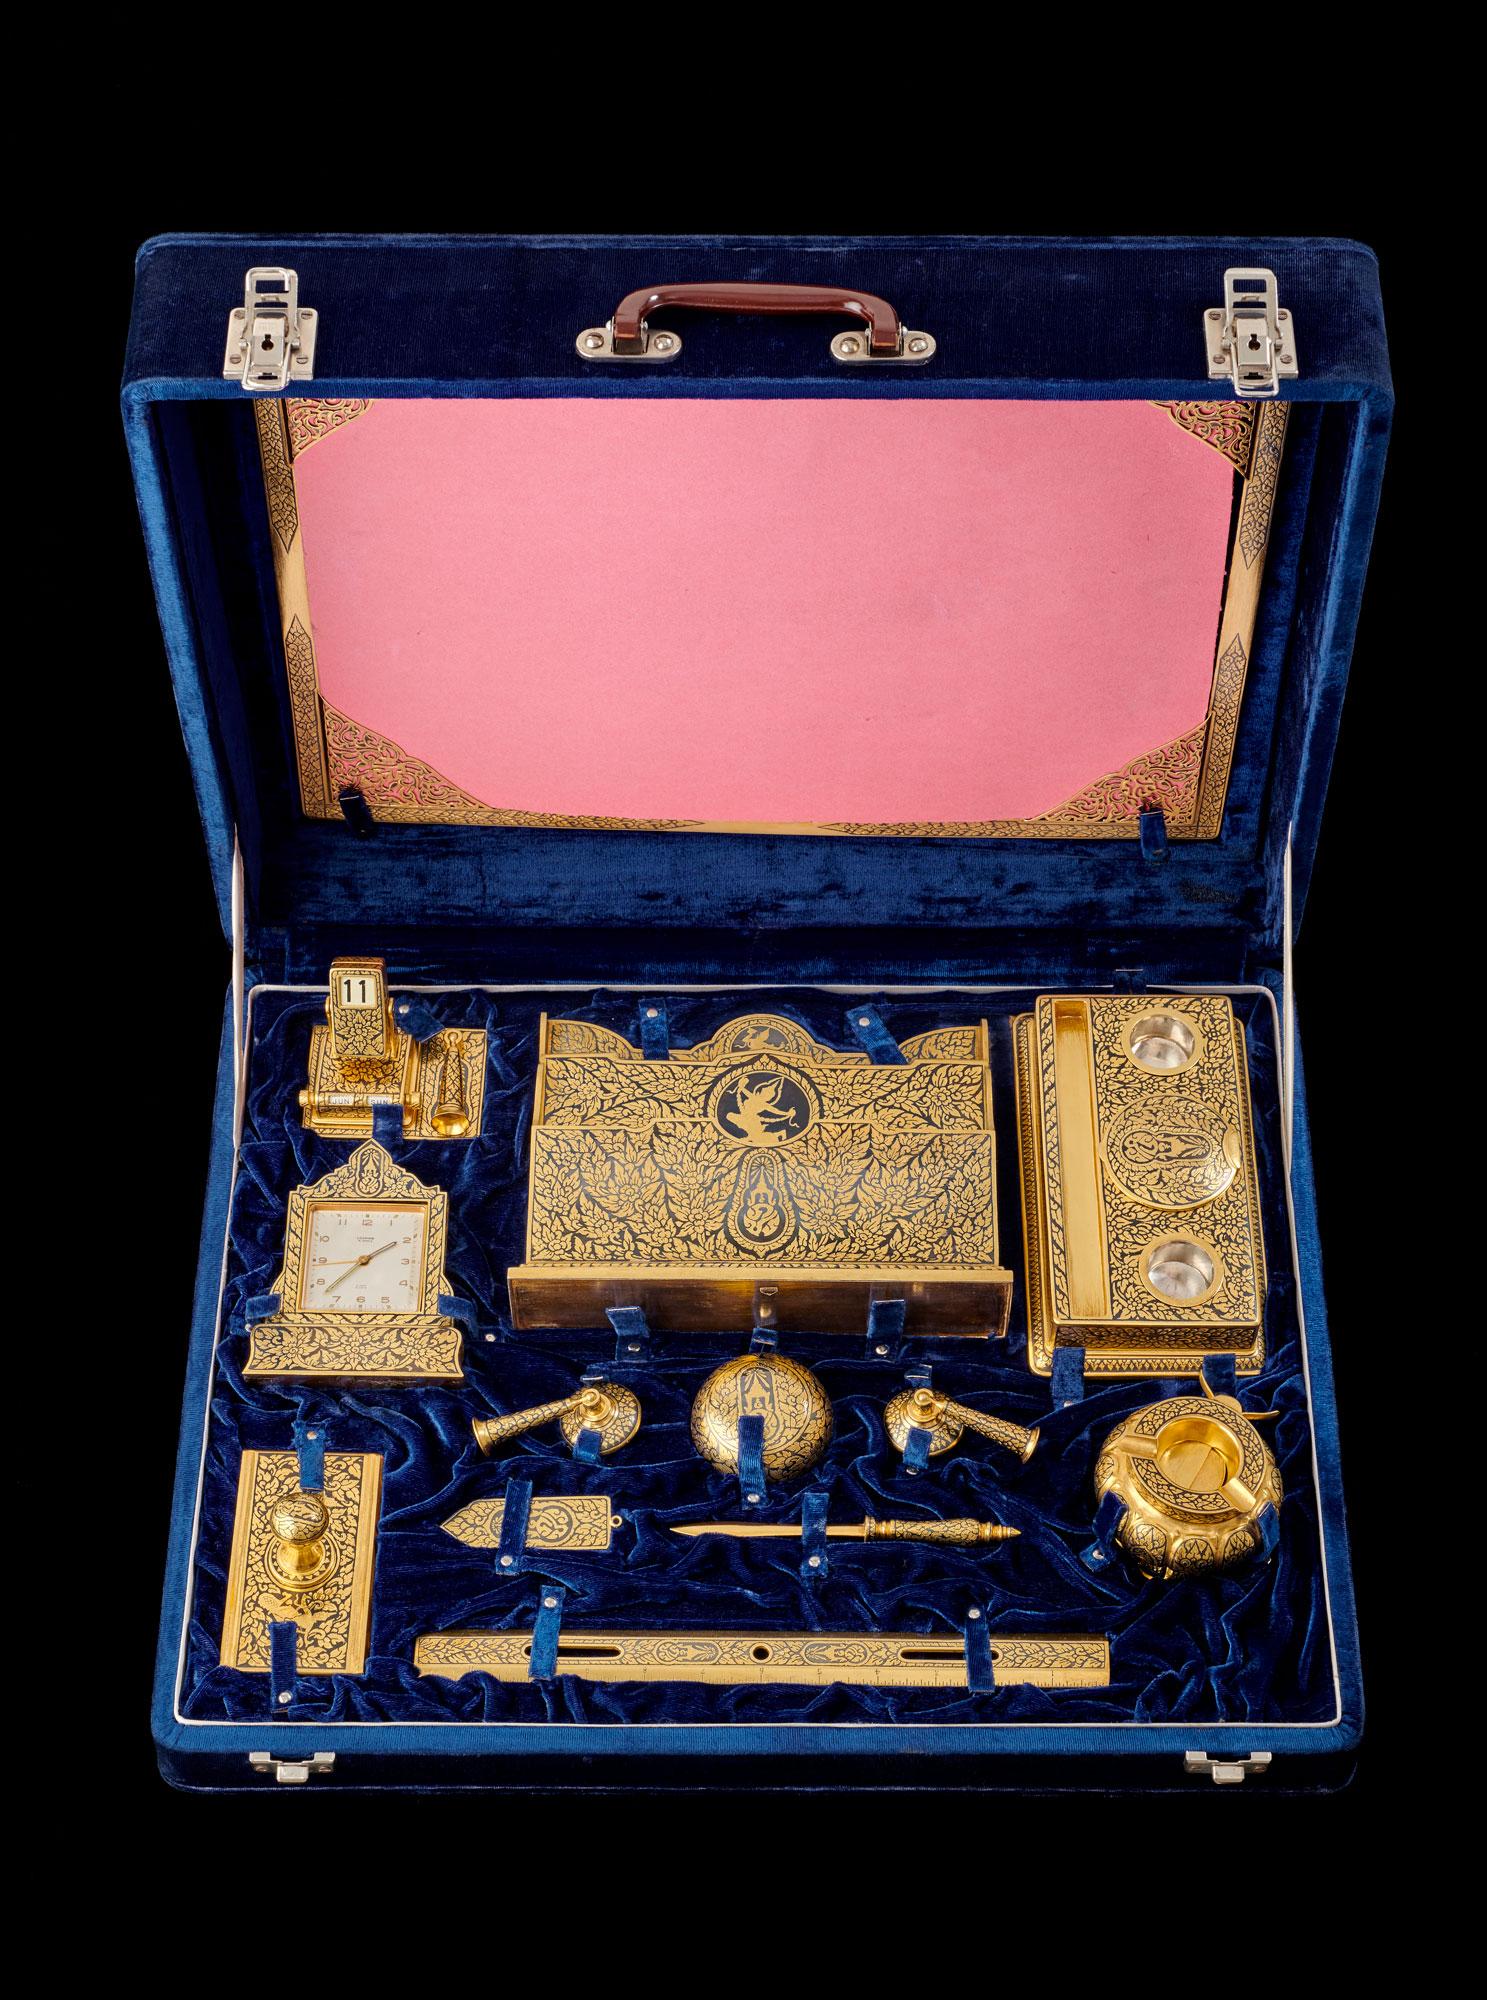 Gold Niello Desk Set Gift from King Bhumibol Adulyadej to President Dwight D. Eisenhower, 1960 35.8 x 45.7 cm Courtesy of the Dwight D. Eisenhower Presidential Library and Museum; 63-378. 1-12  ชุดเครื่องเขียนถมทอง ของขวัญพระราชทานจากพระบาทสมเด็จพระปรมินทรมหาภูมิพลอดุลยเดช แก่ประธานาธิบดีดไวท์ ดี. ไอเซนฮาวร์ พ.ศ. ๒๕๐๓ ๓๕.๘ x ๔๕.๗ ซม. ได้รับความอนุเคราะห์จากพิพิธภัณฑ์และหอสมุดประธานาธิบดีดไวท์ ดี. ไอเซนฮาวร์; 63-378. 1-12